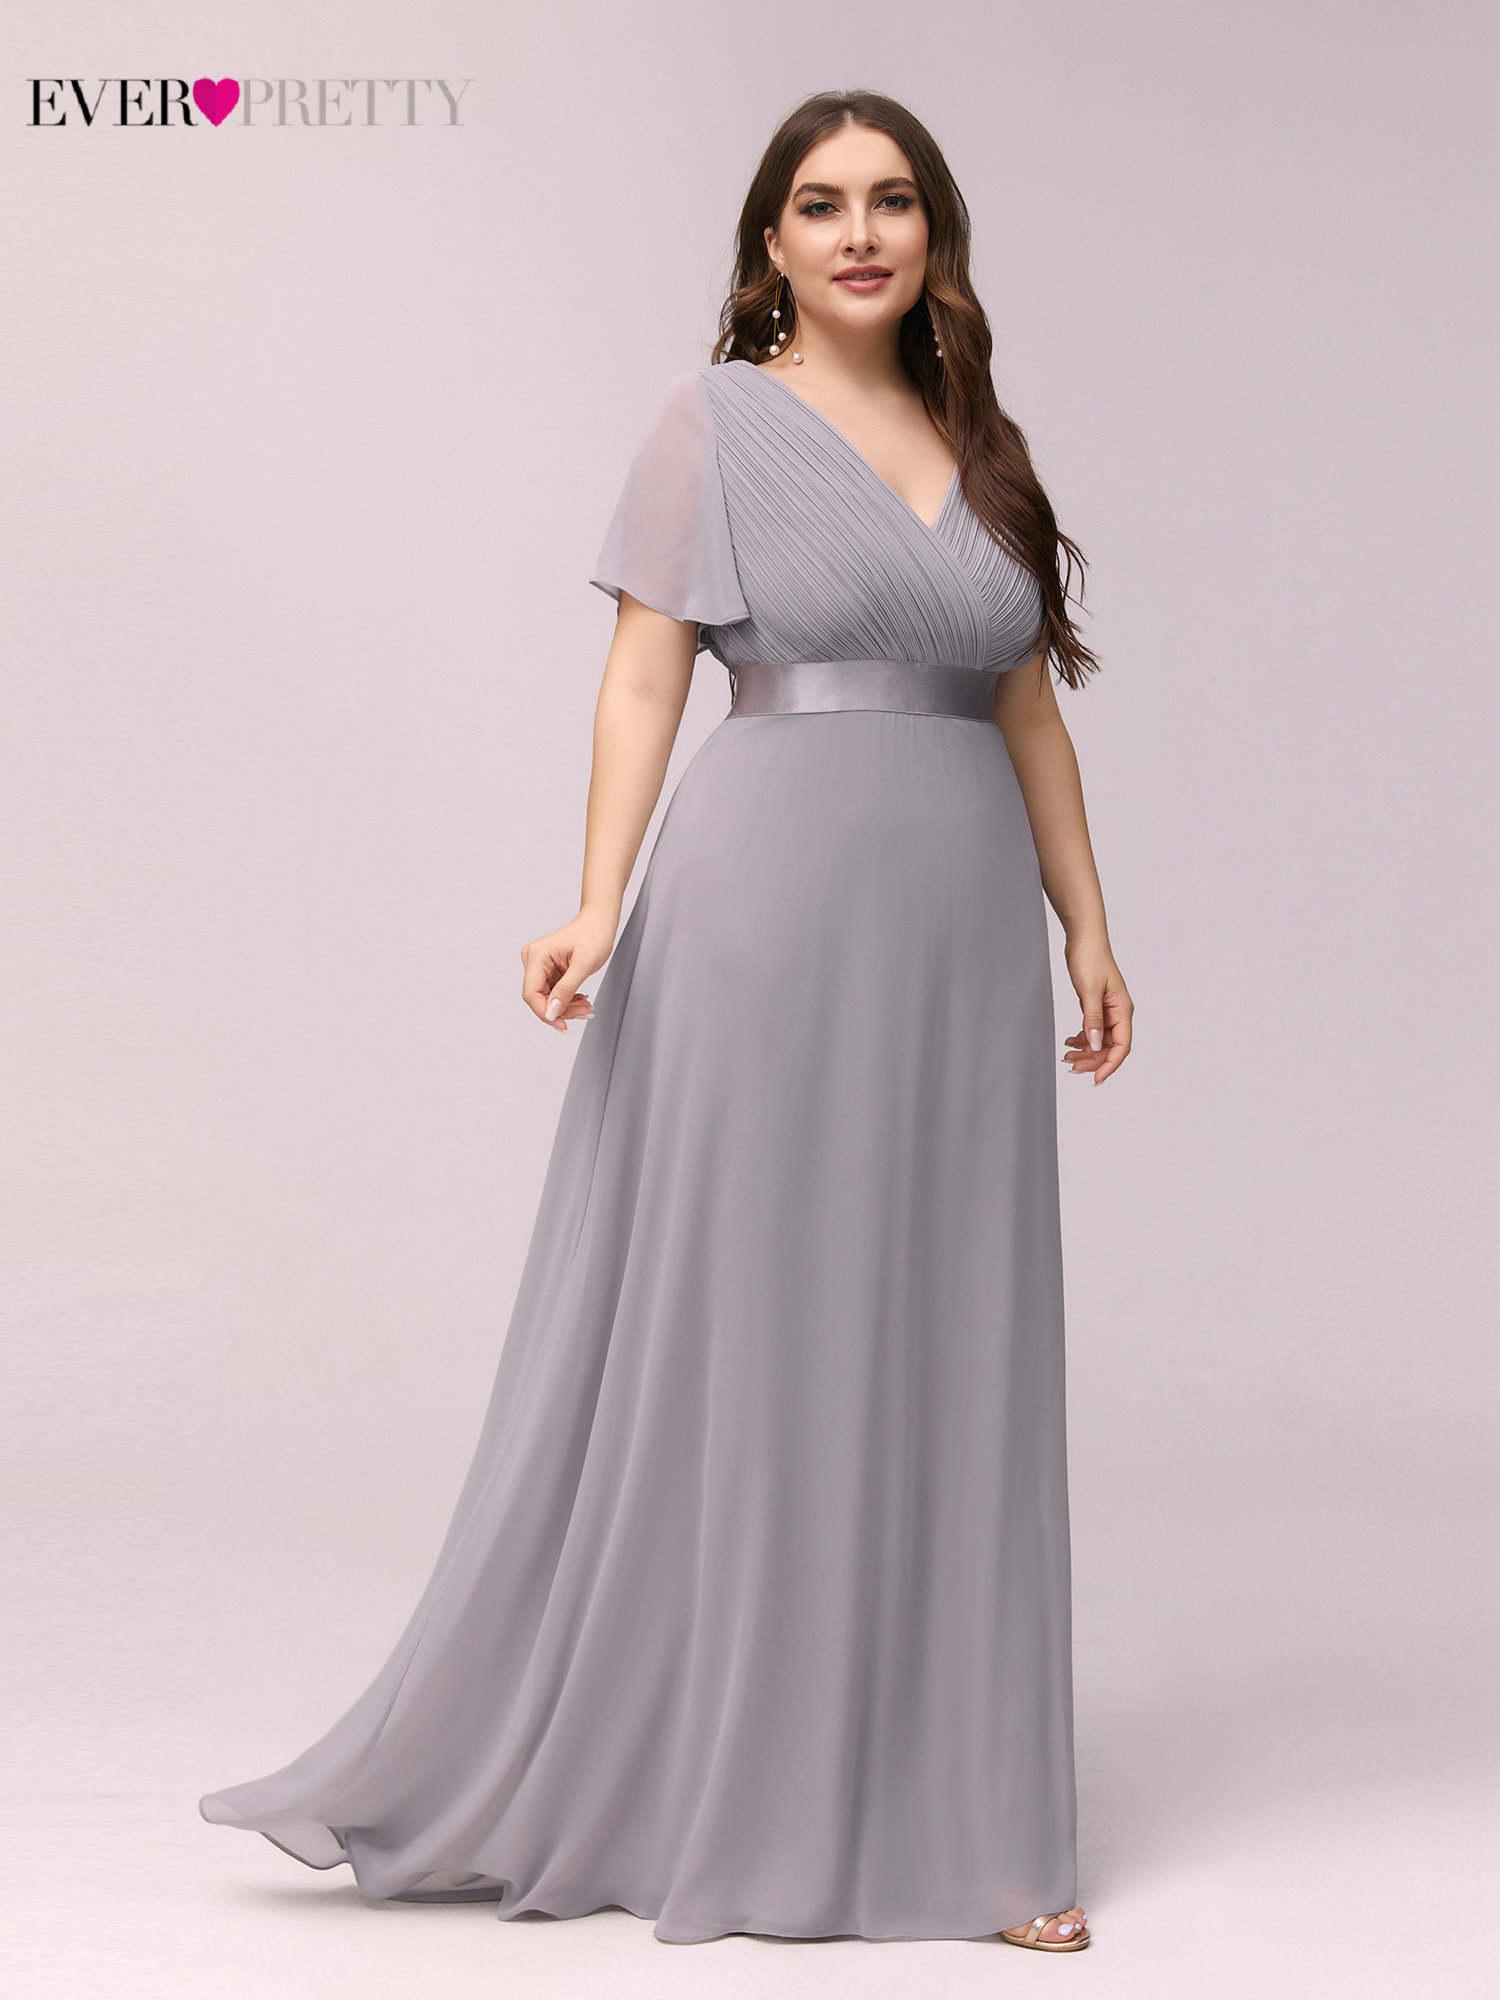 Party-Dress Evening-Dresses Robe-De-Soiree Ever Pretty Chiffon Formal Elegant Ruffles